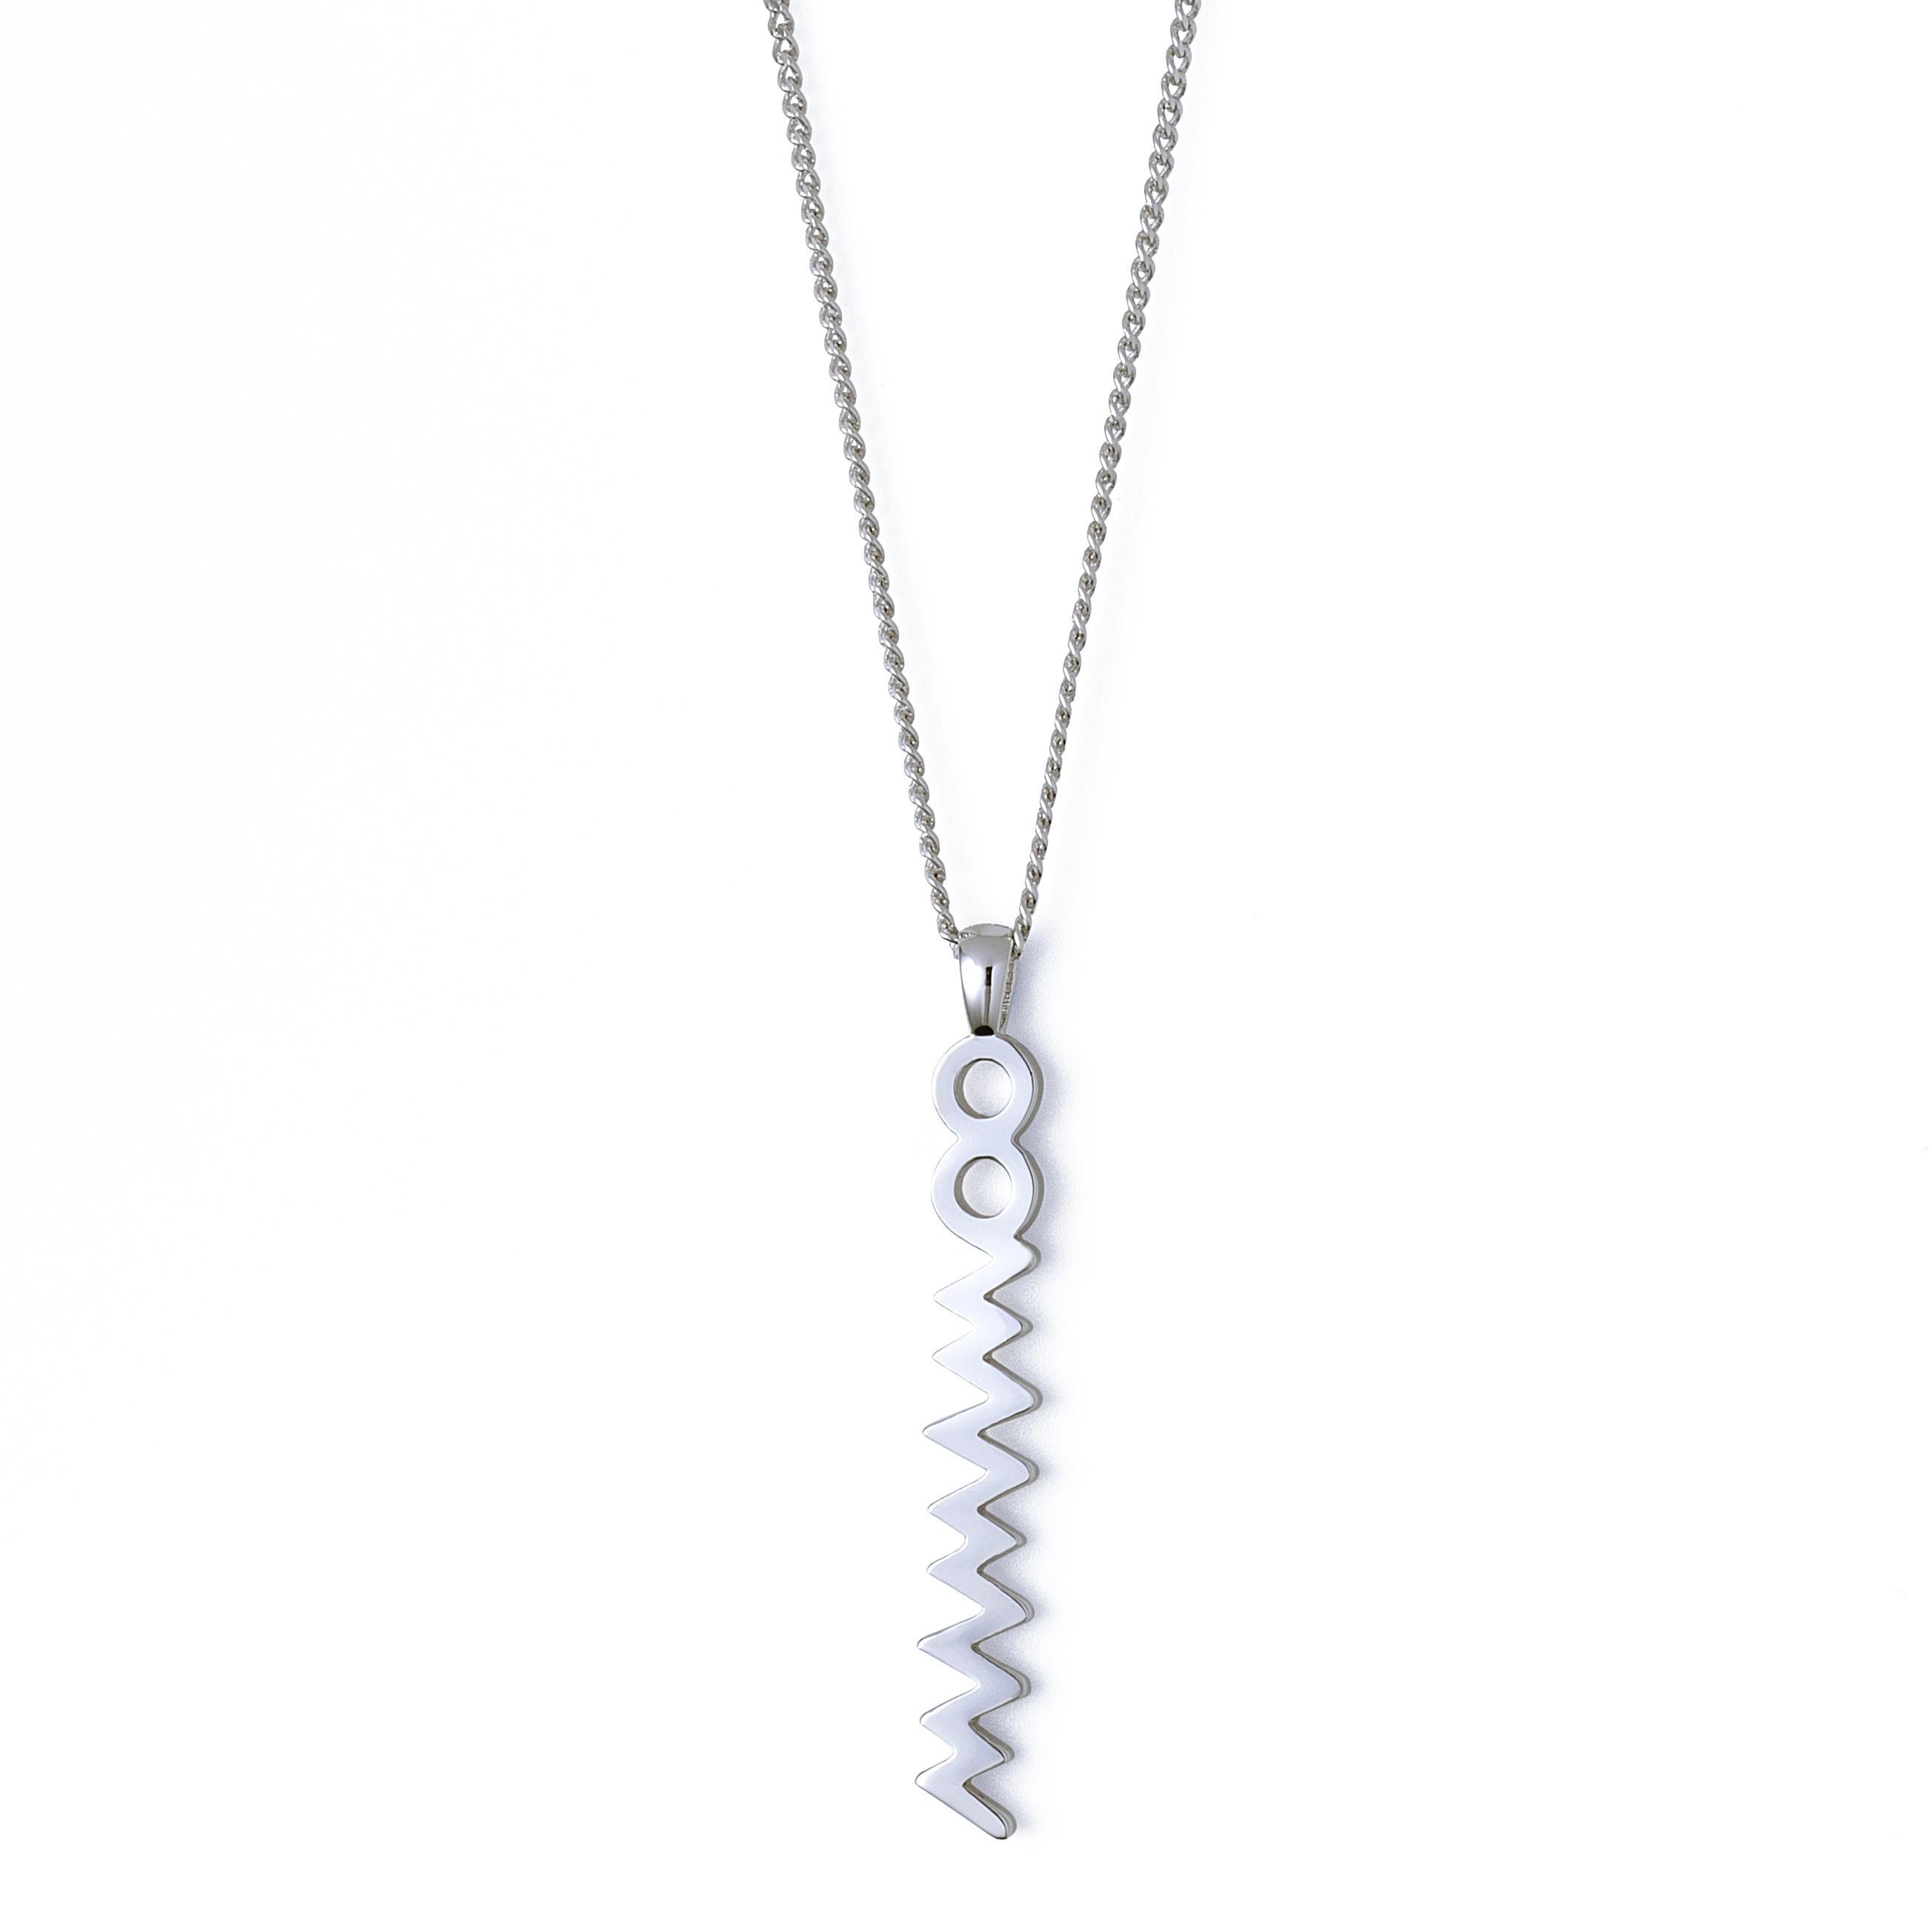 mmm_neck_silver